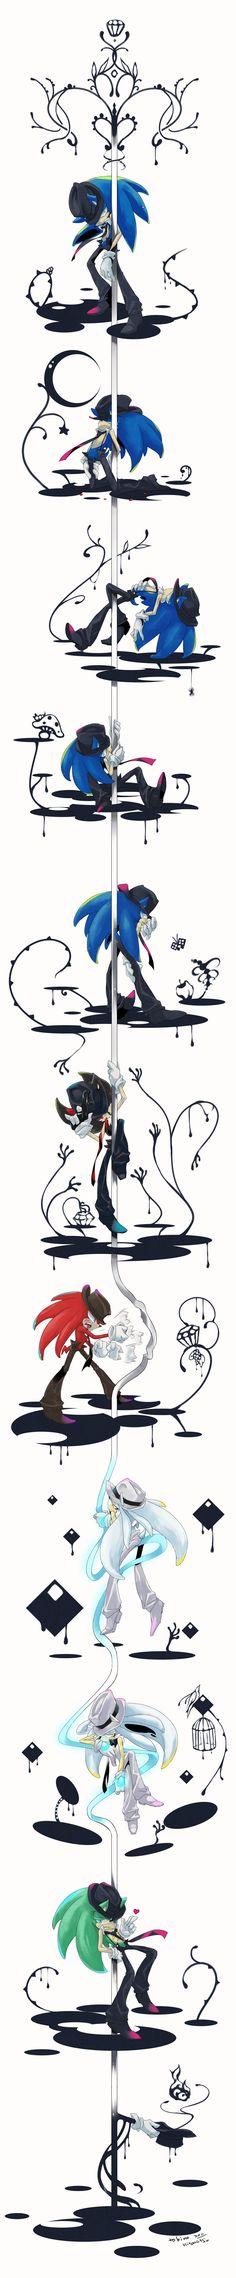 Sonic pole dancing by hitonatsu